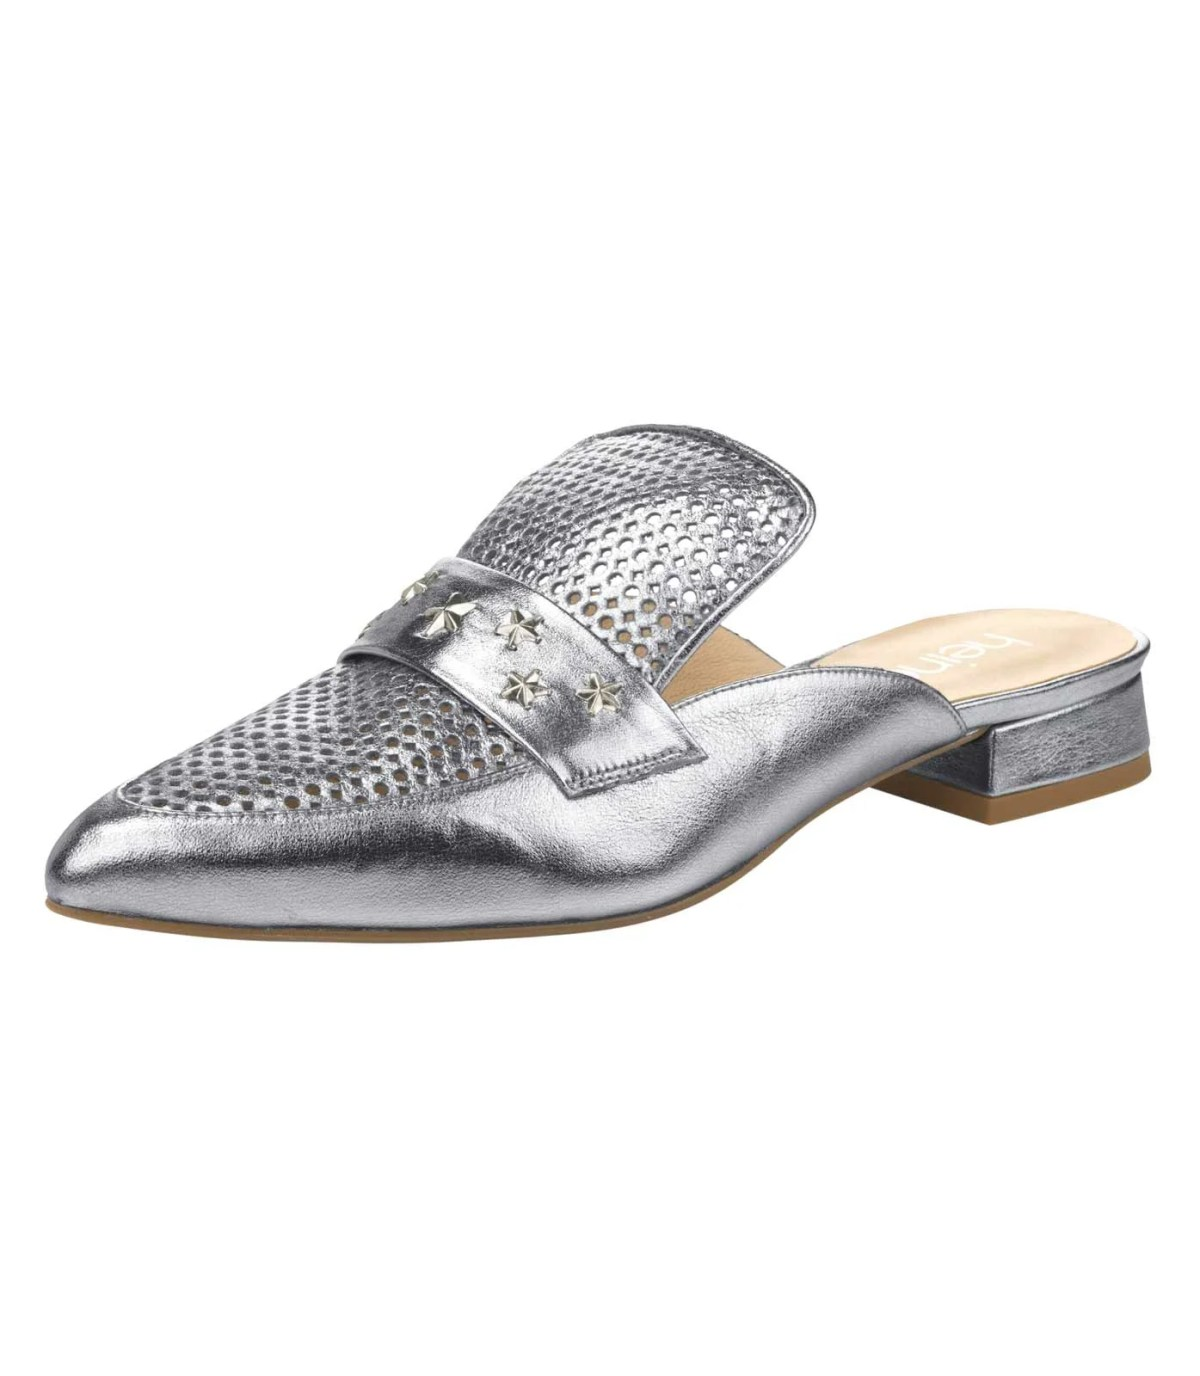 166.029 HEINE Damen Designer-Leder-Pantolette Silberfarben